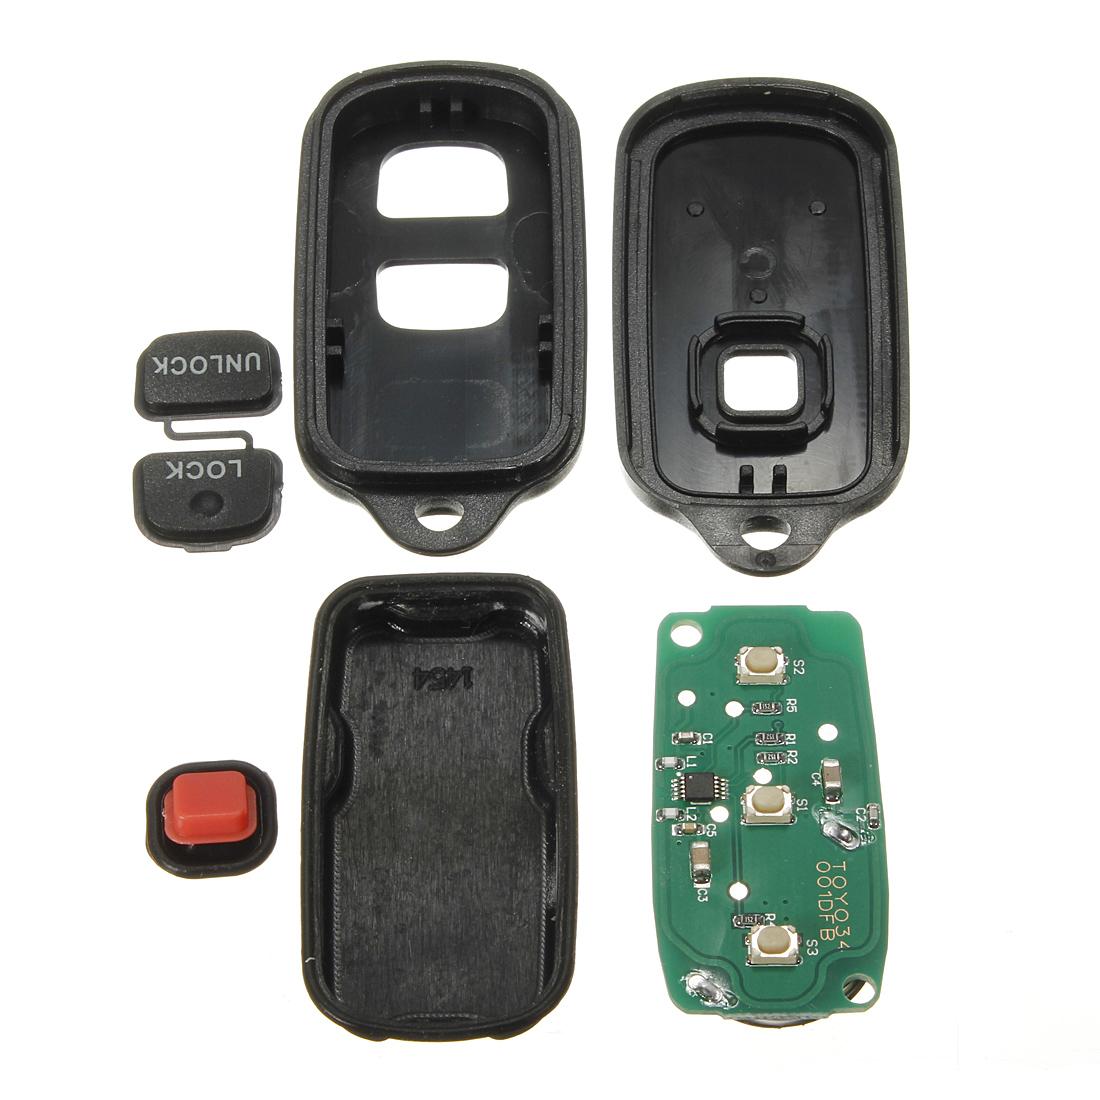 keyless remote entry key fob transmitter for toyota rav4. Black Bedroom Furniture Sets. Home Design Ideas